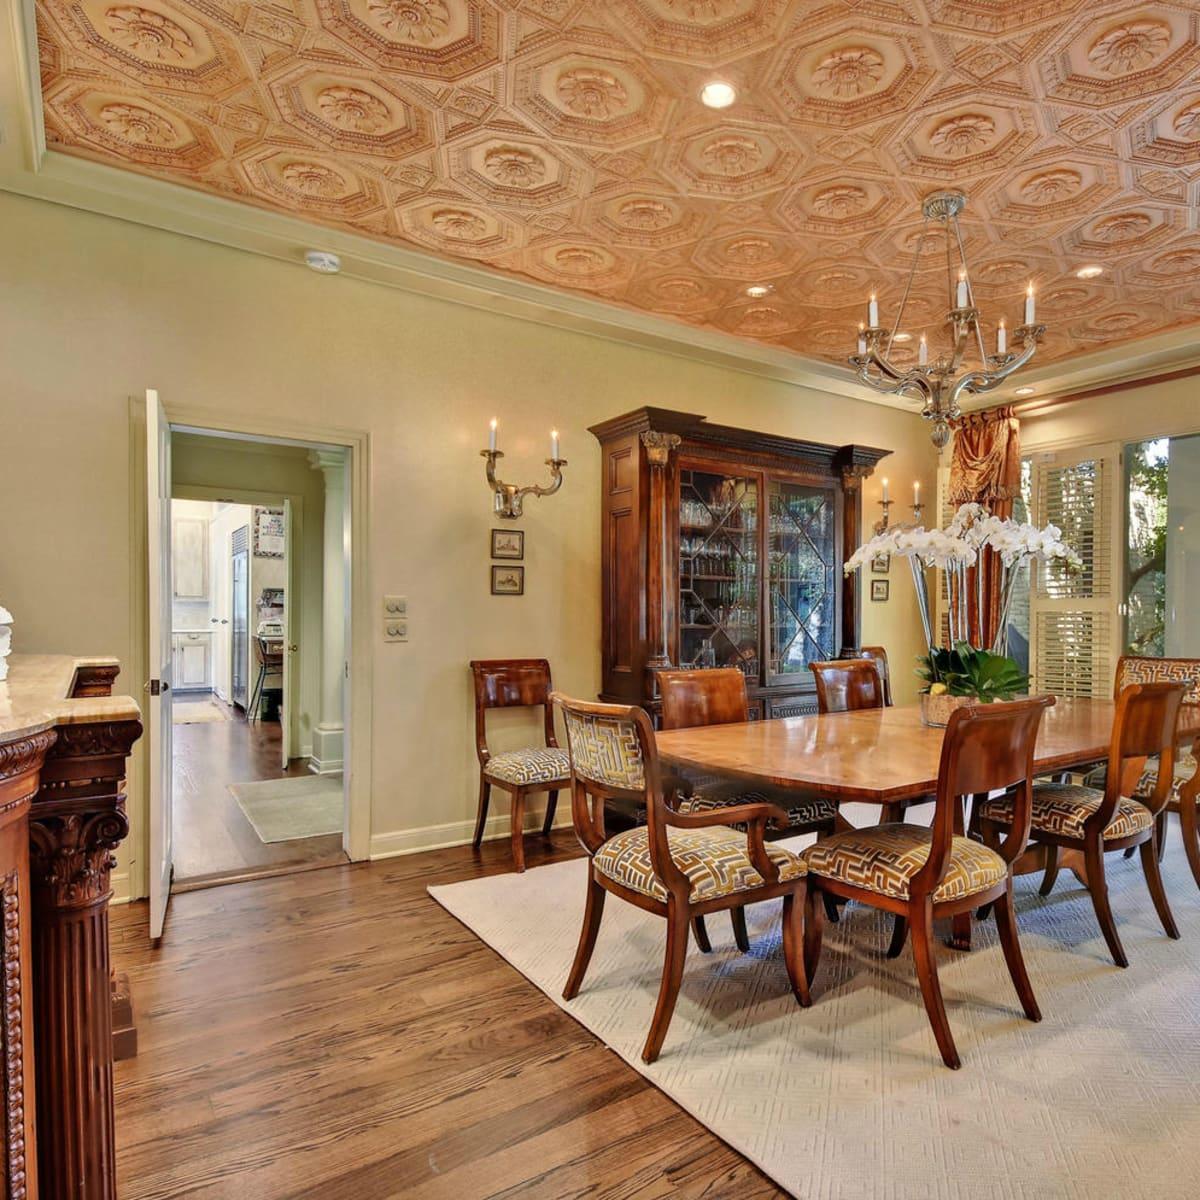 Austin house home Tarrytown 2610 Kenmore Court Ben Crenshaw February 2016 dining